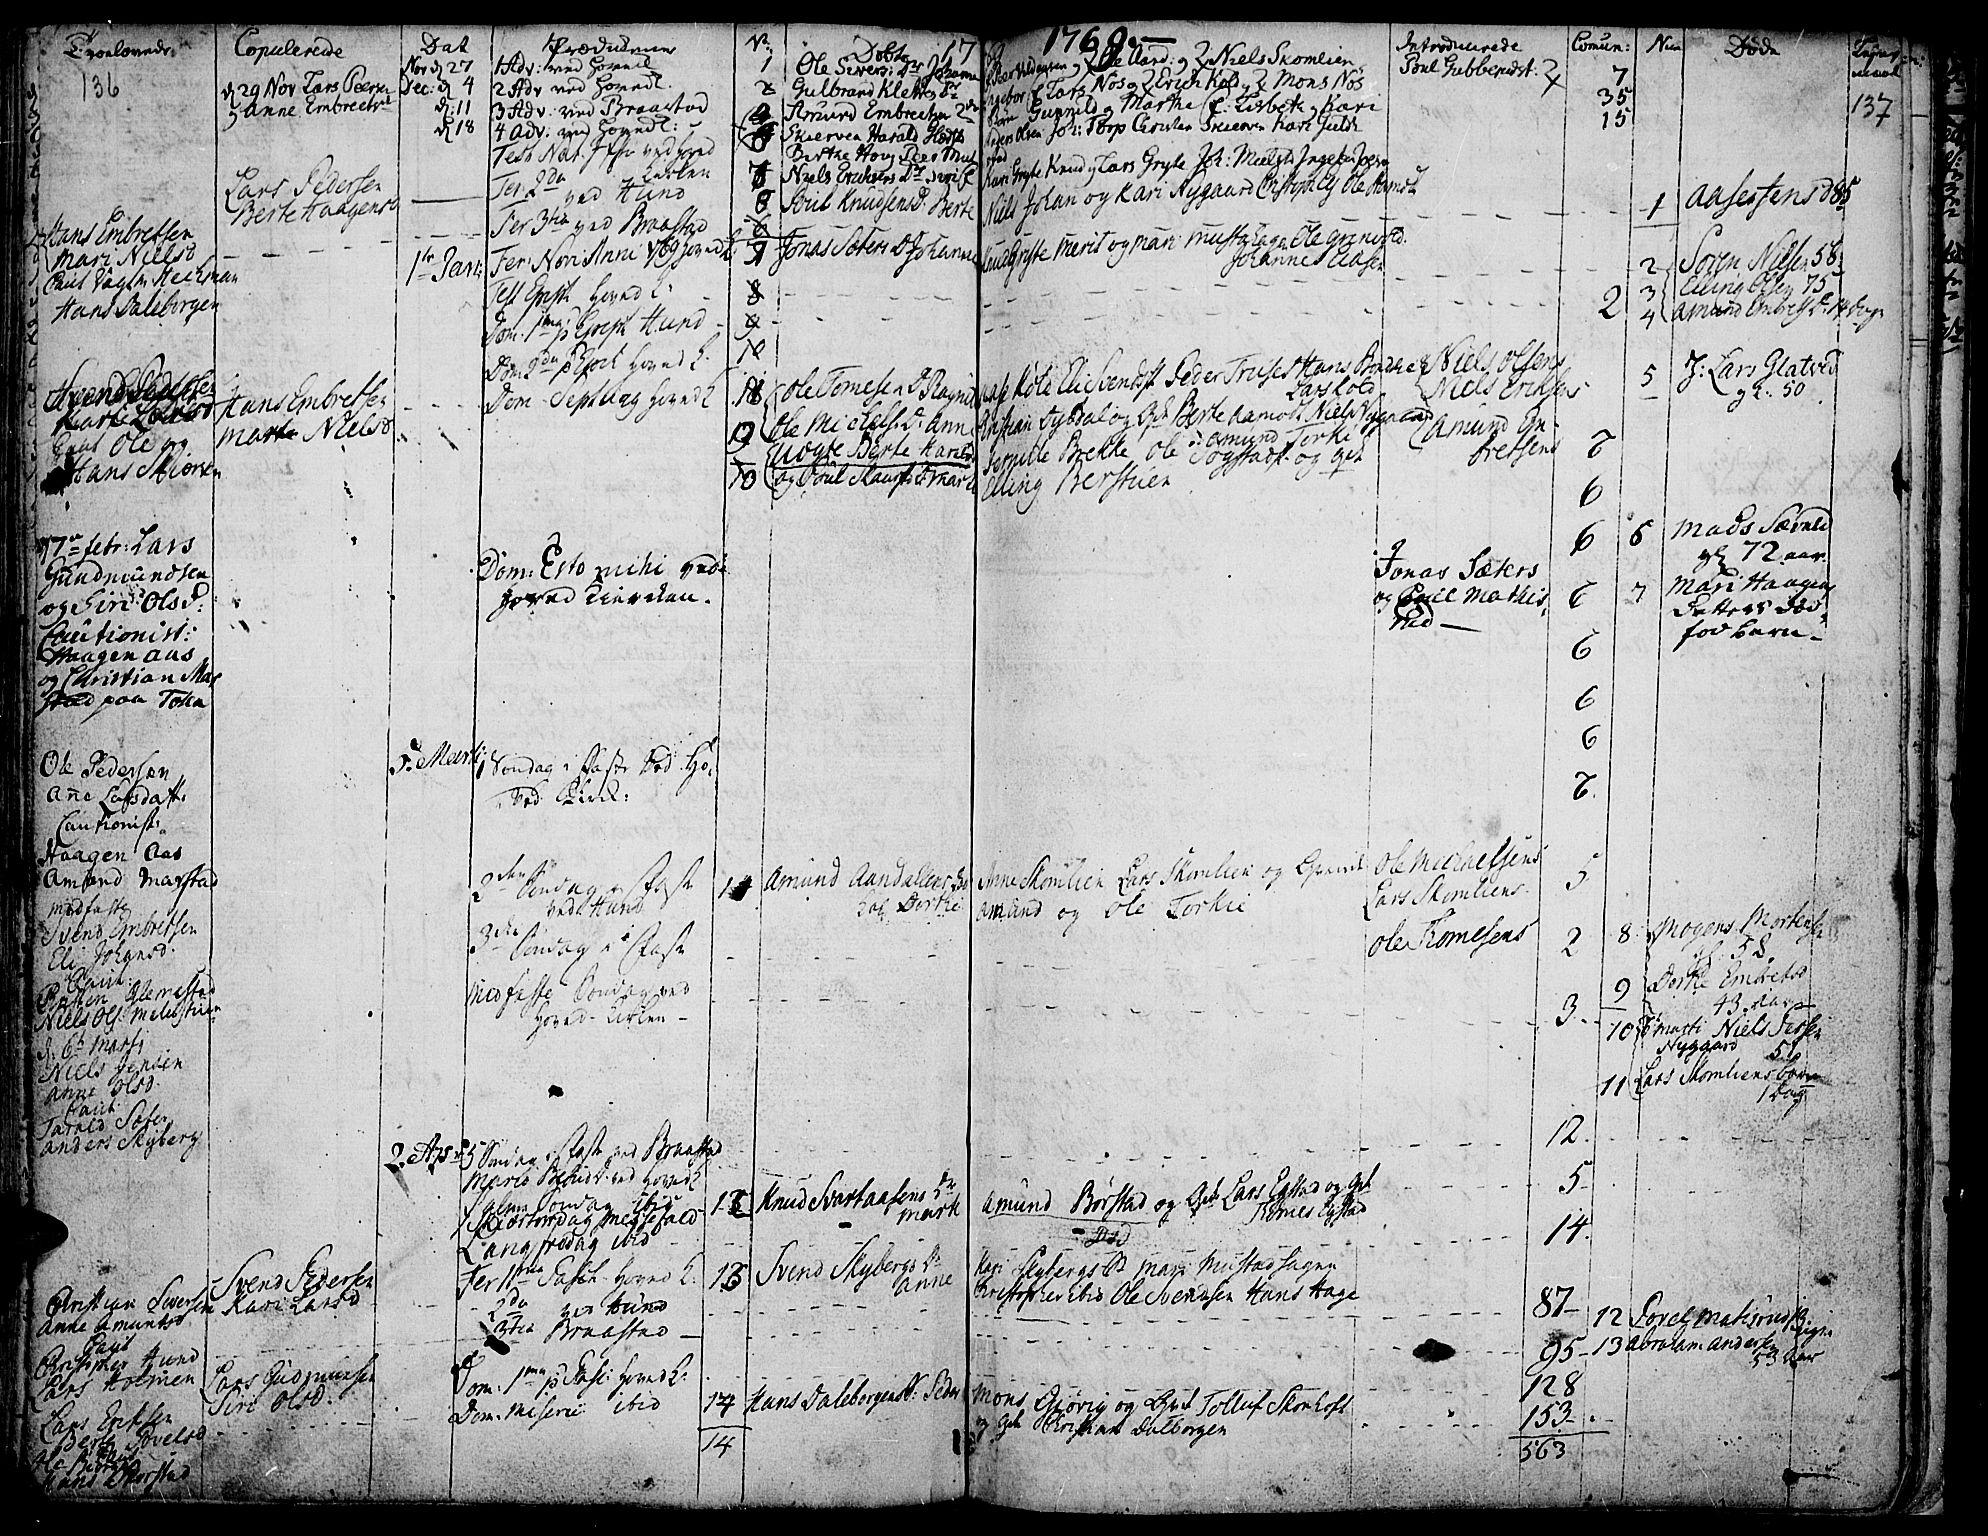 SAH, Vardal prestekontor, H/Ha/Haa/L0002: Ministerialbok nr. 2, 1748-1776, s. 136-137